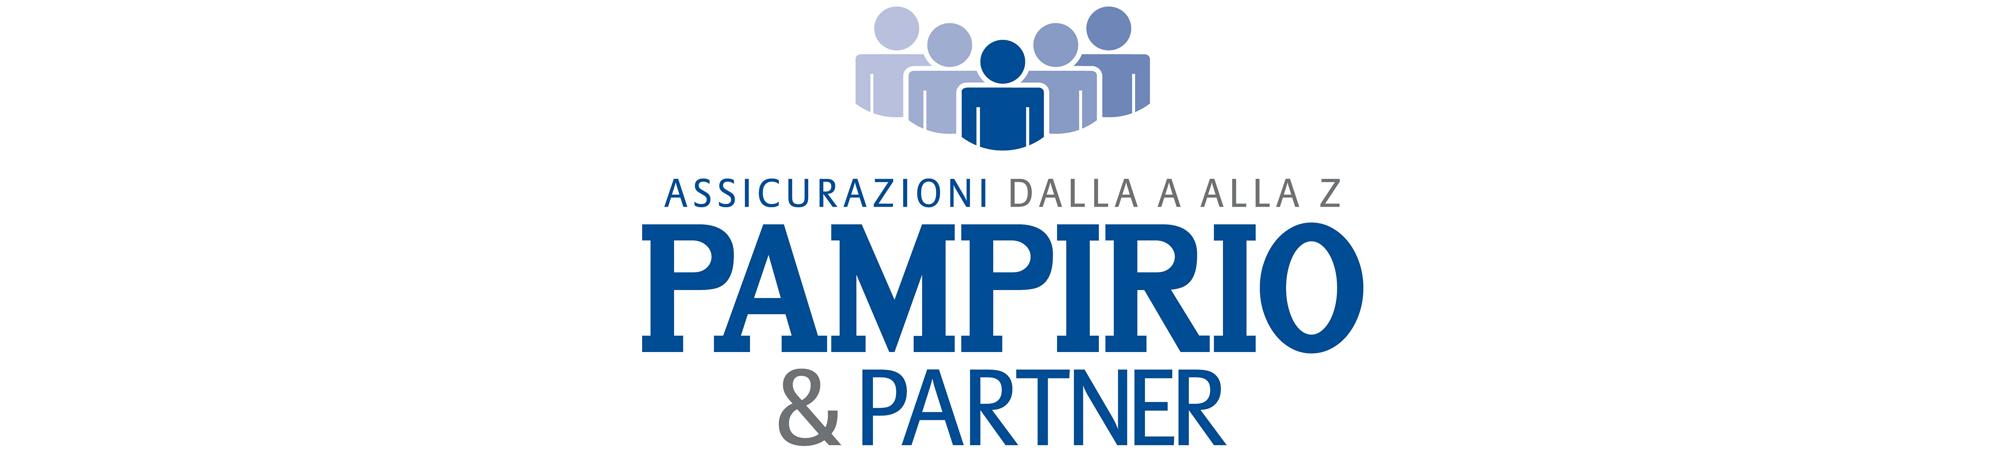 pampirio_logo2